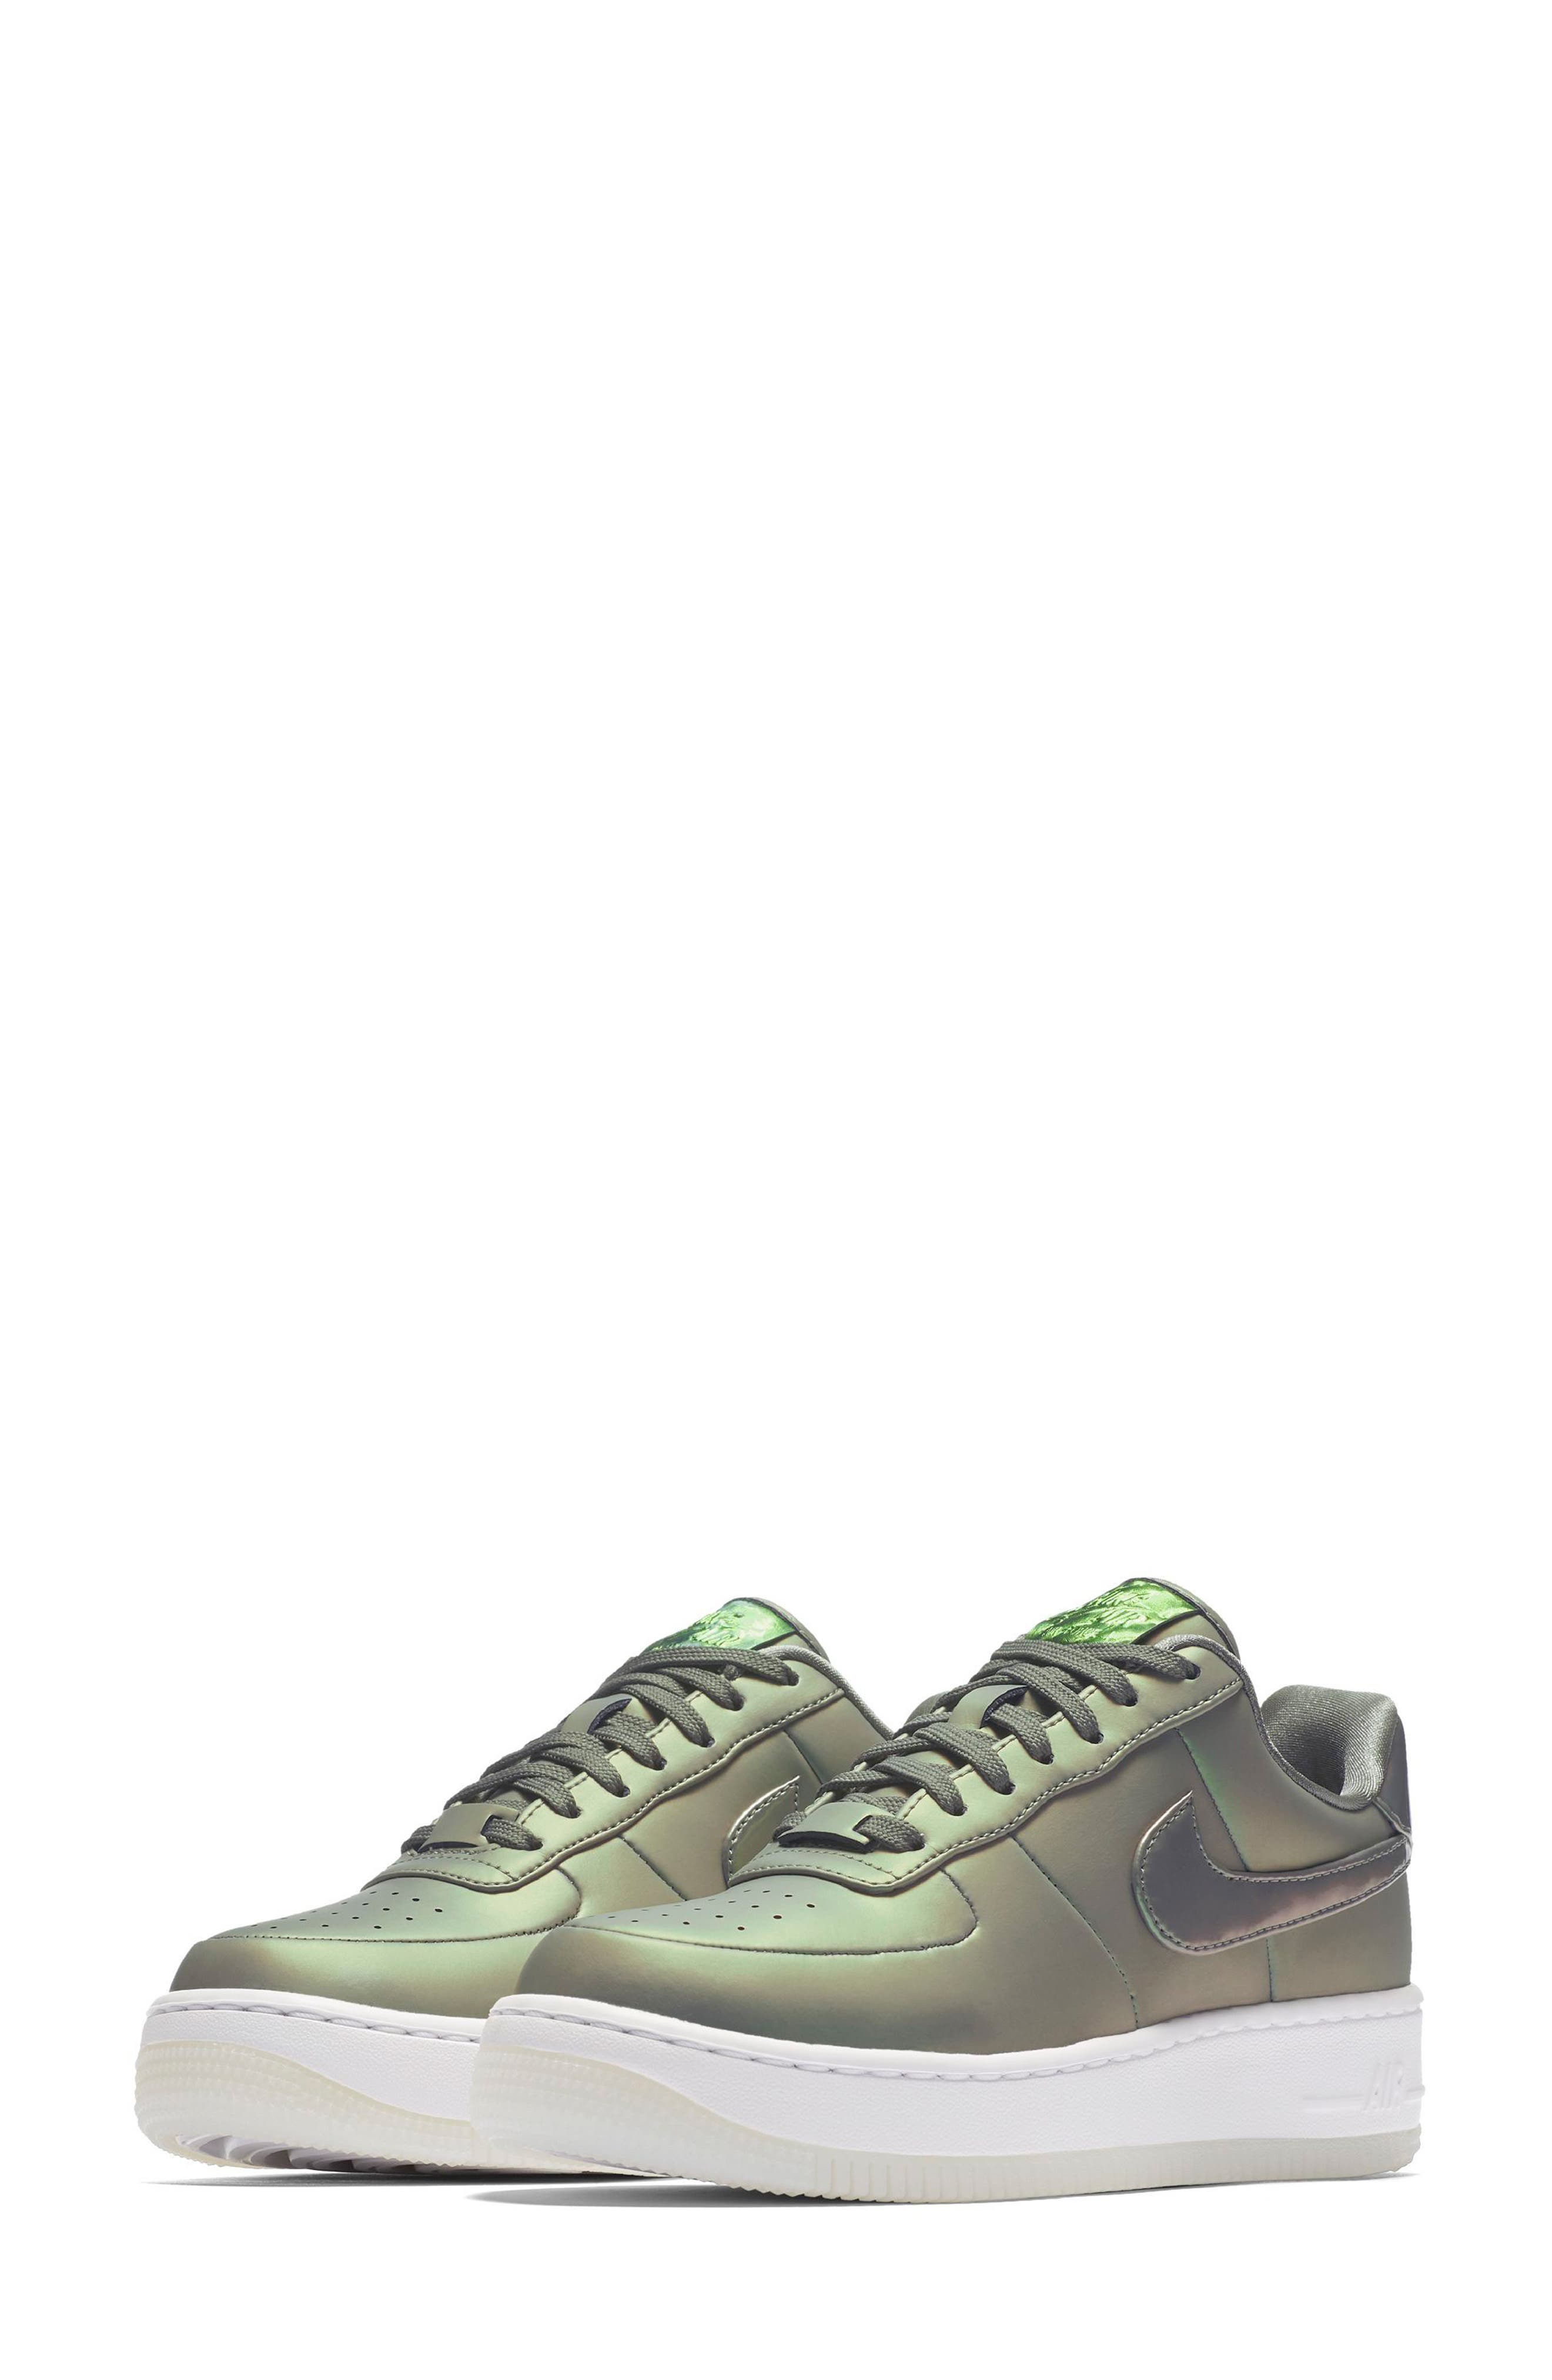 Air Force 1 Upstep Premium LX Shoe,                             Main thumbnail 1, color,                             Dark Stucco/ Stucco/ White